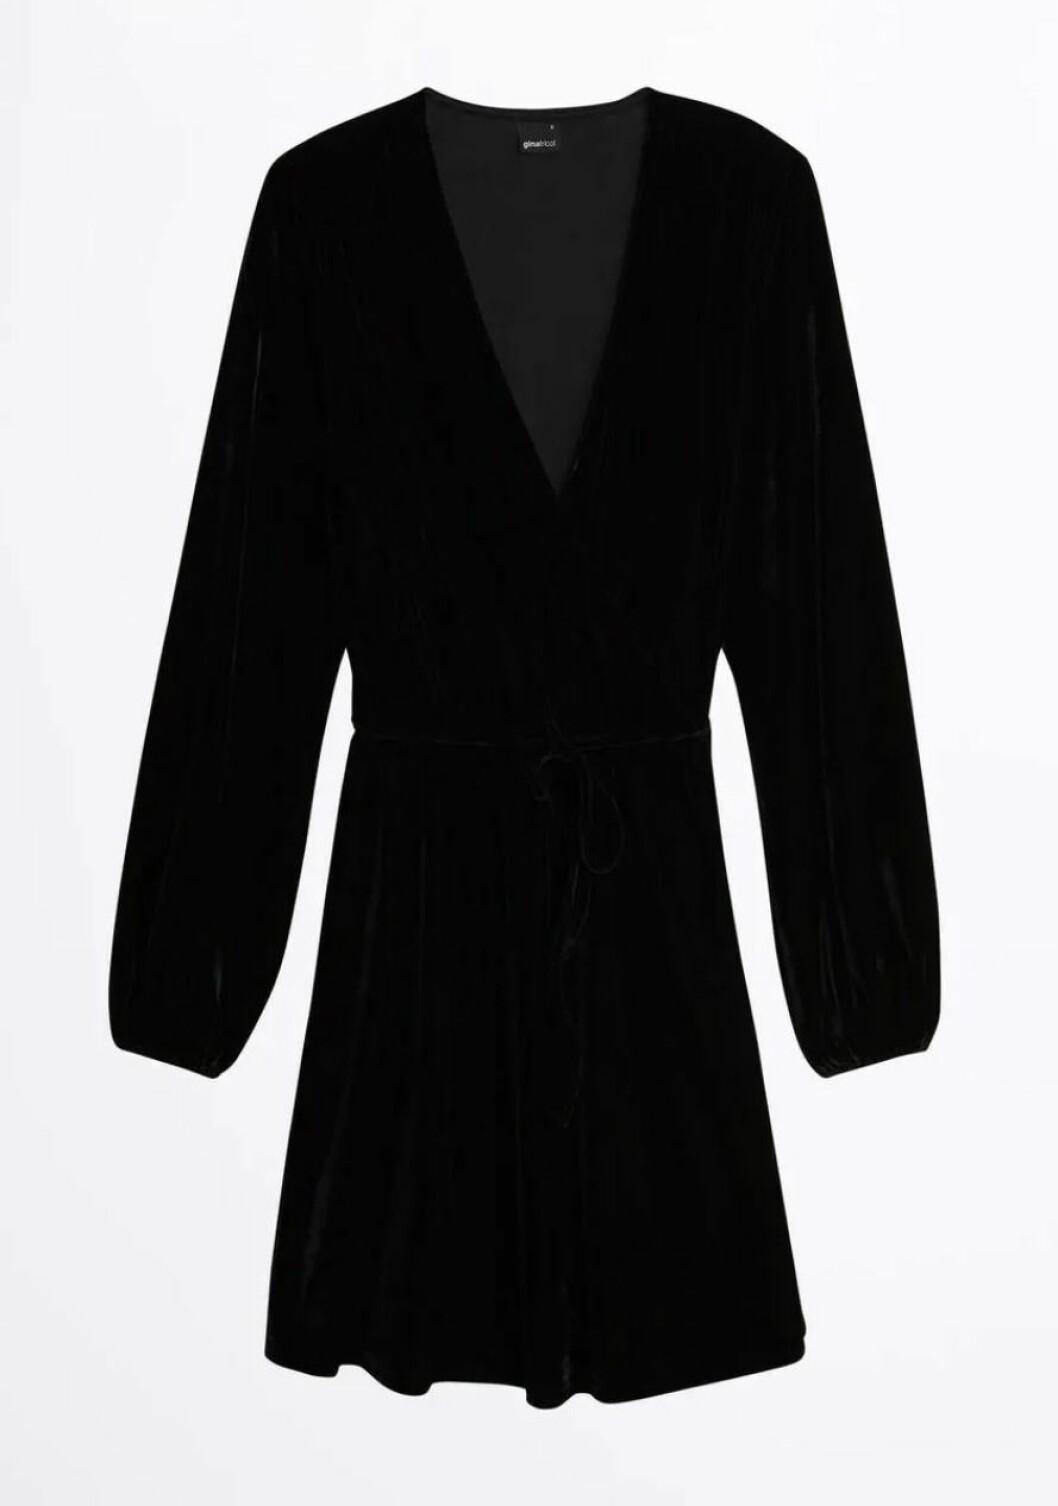 Gina tricot mini svart sammetsklänning